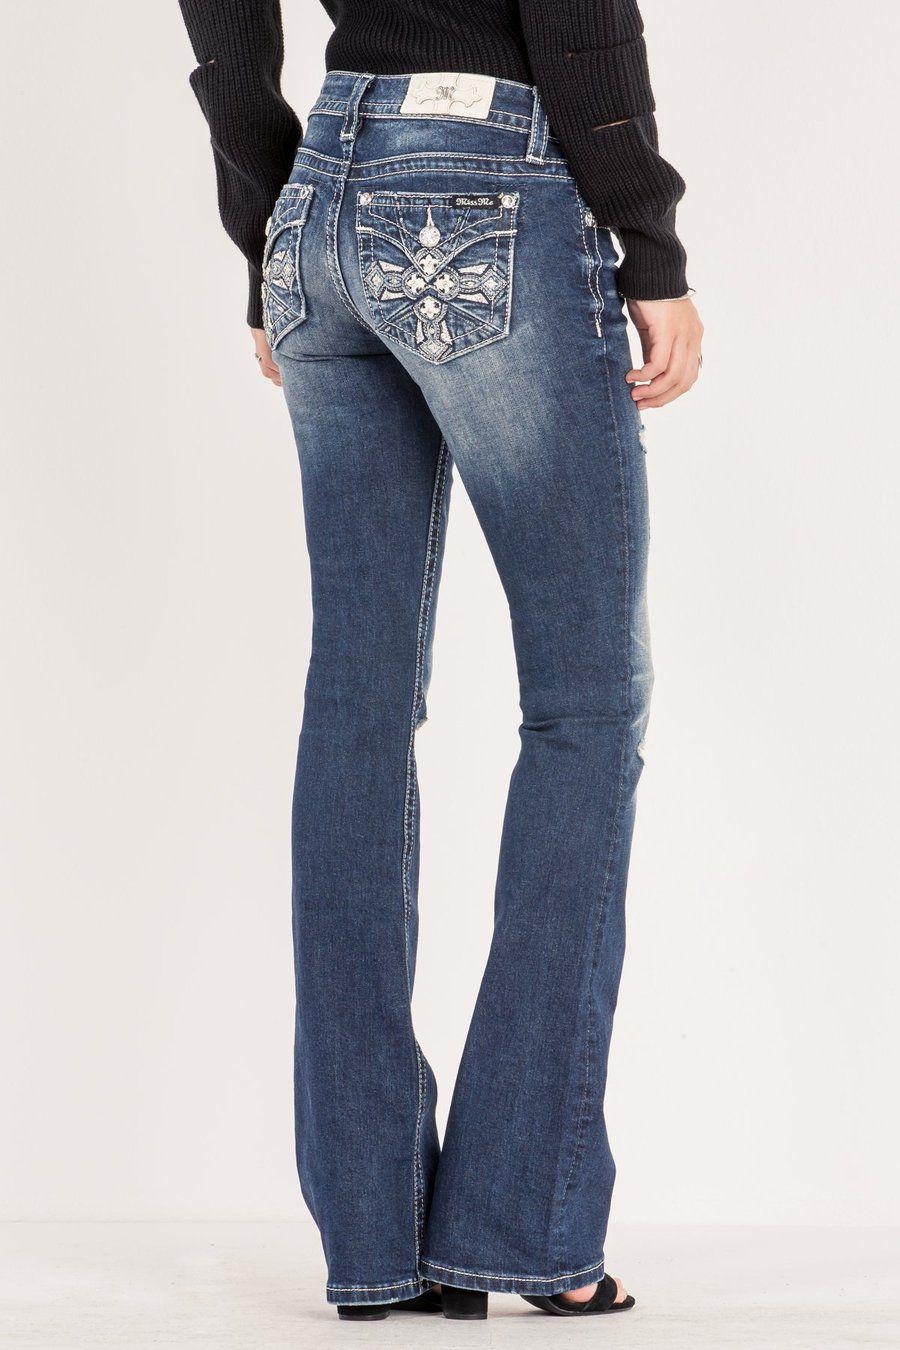 ea71c6534cff2 Calça Jeans Feminina Importada Miss Me- M3223B